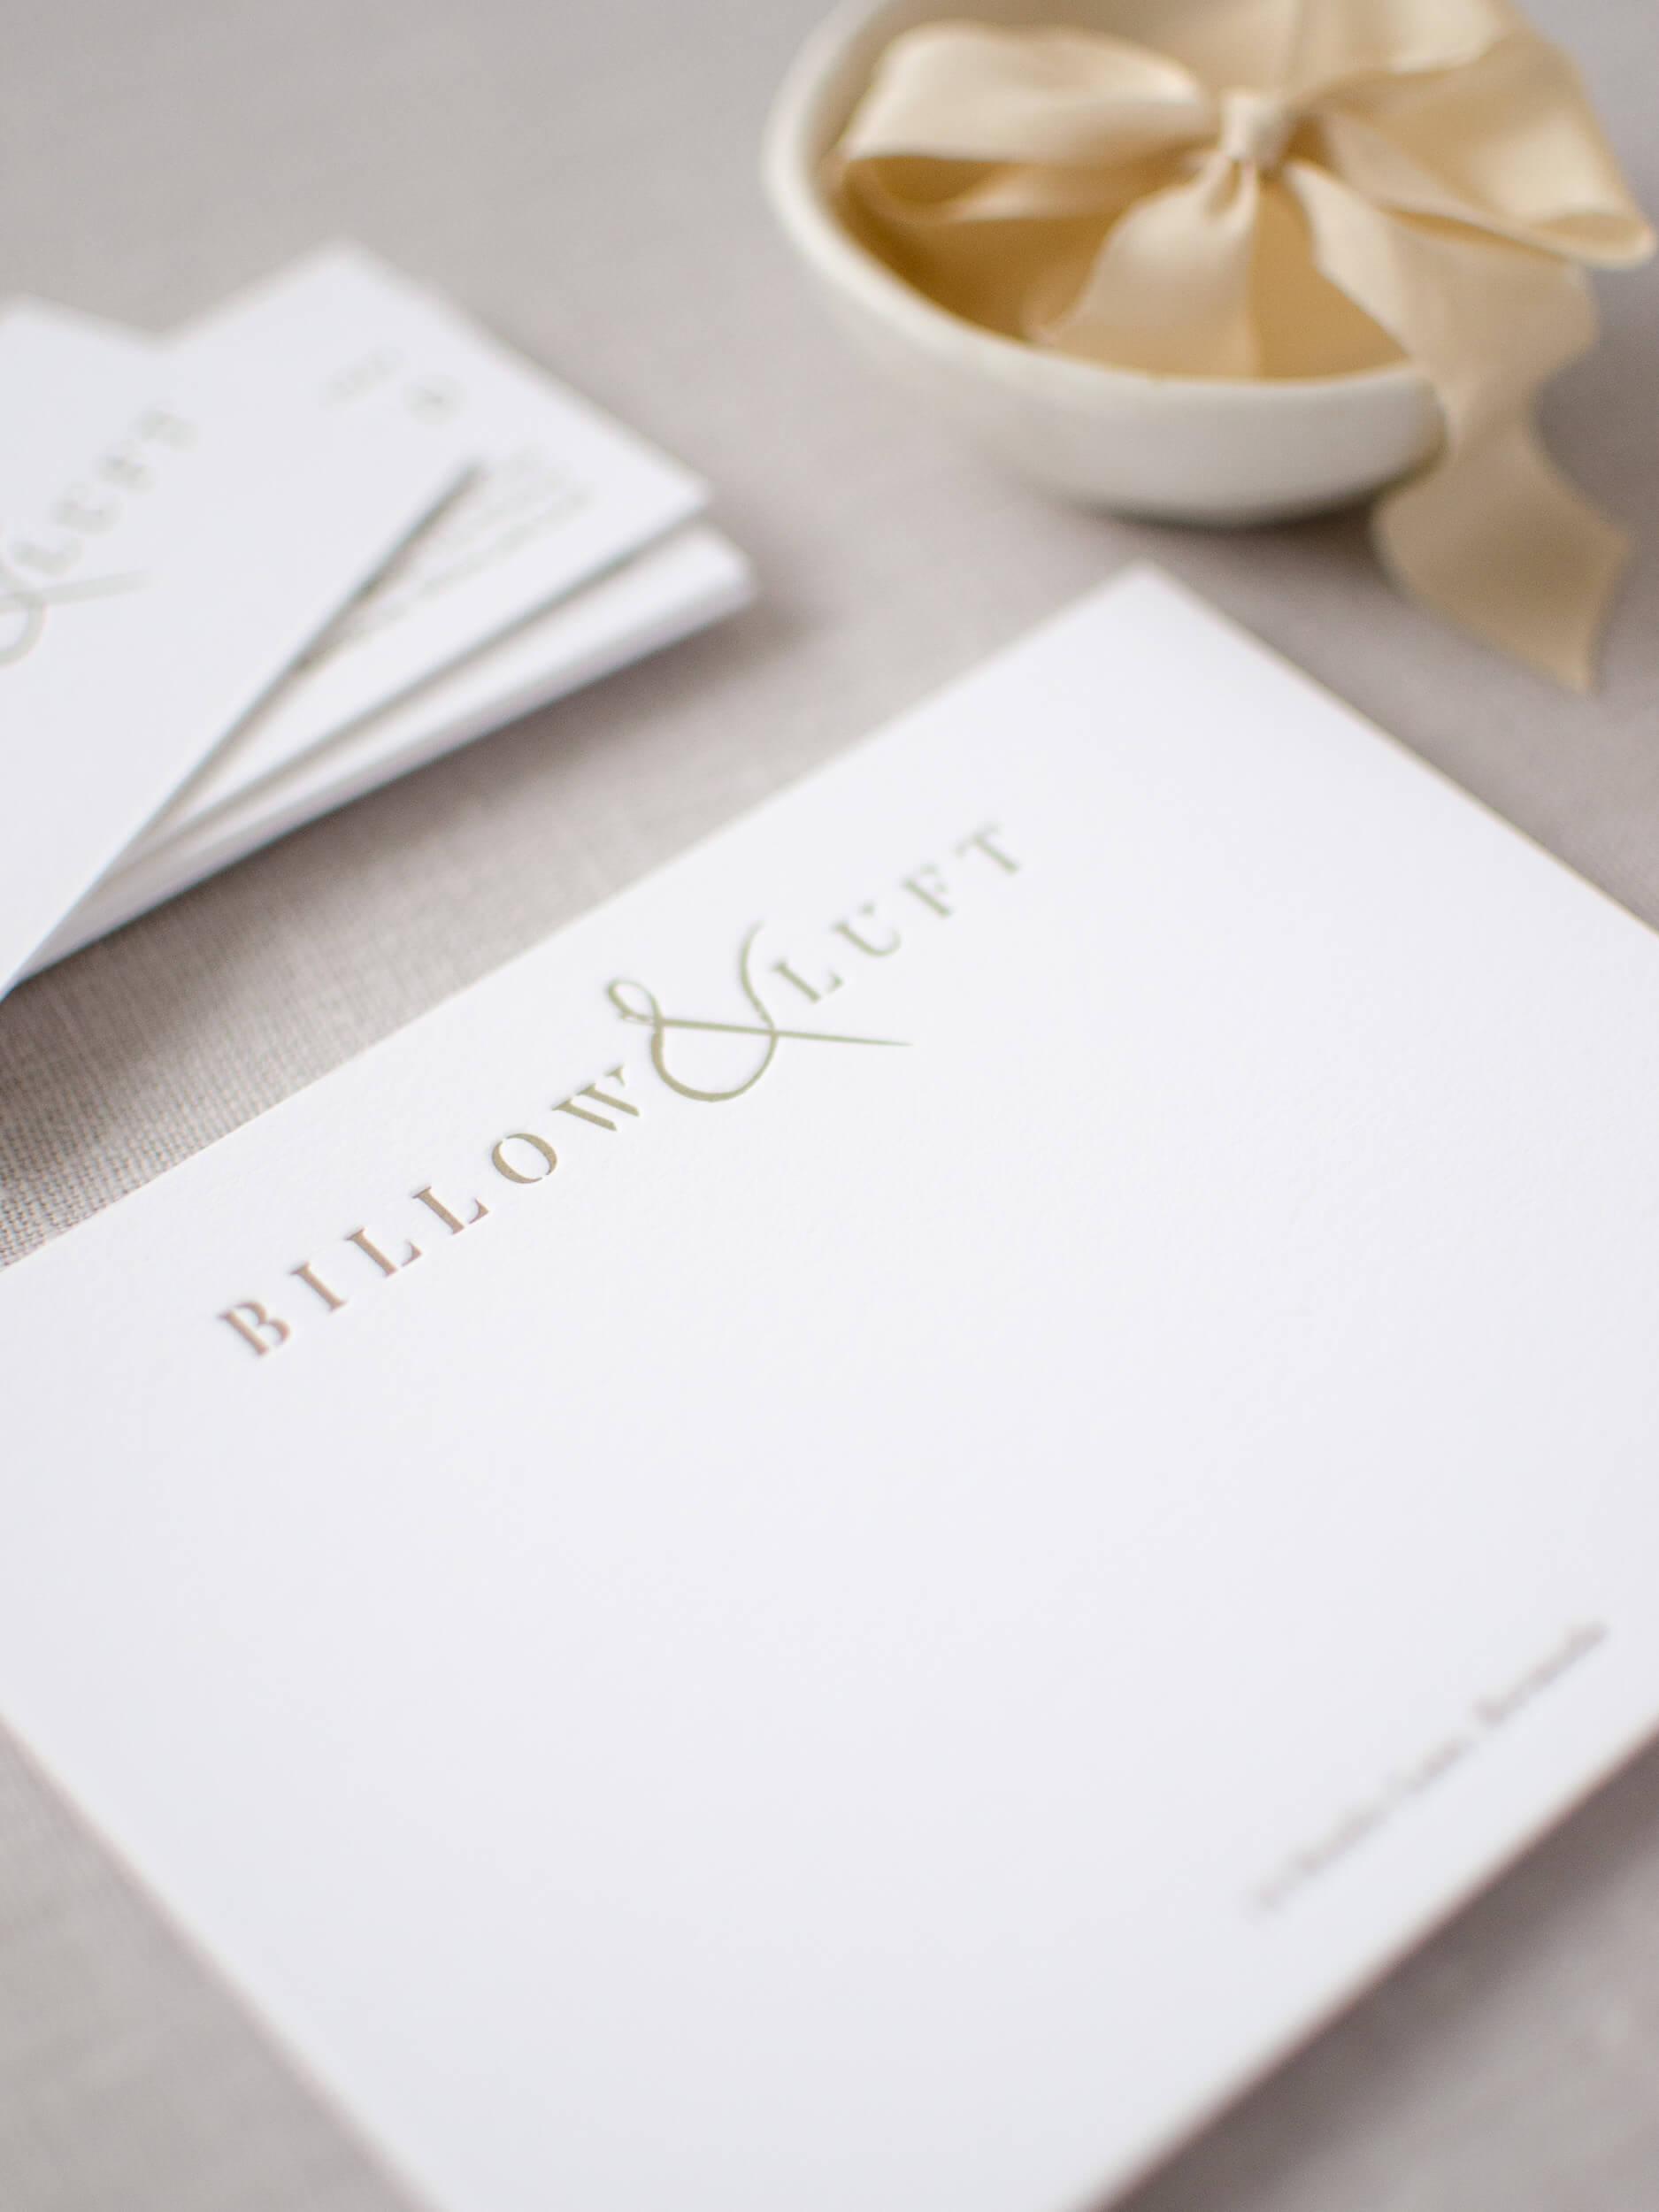 letterpress-gold-ink-branding-billow-luft.jpg